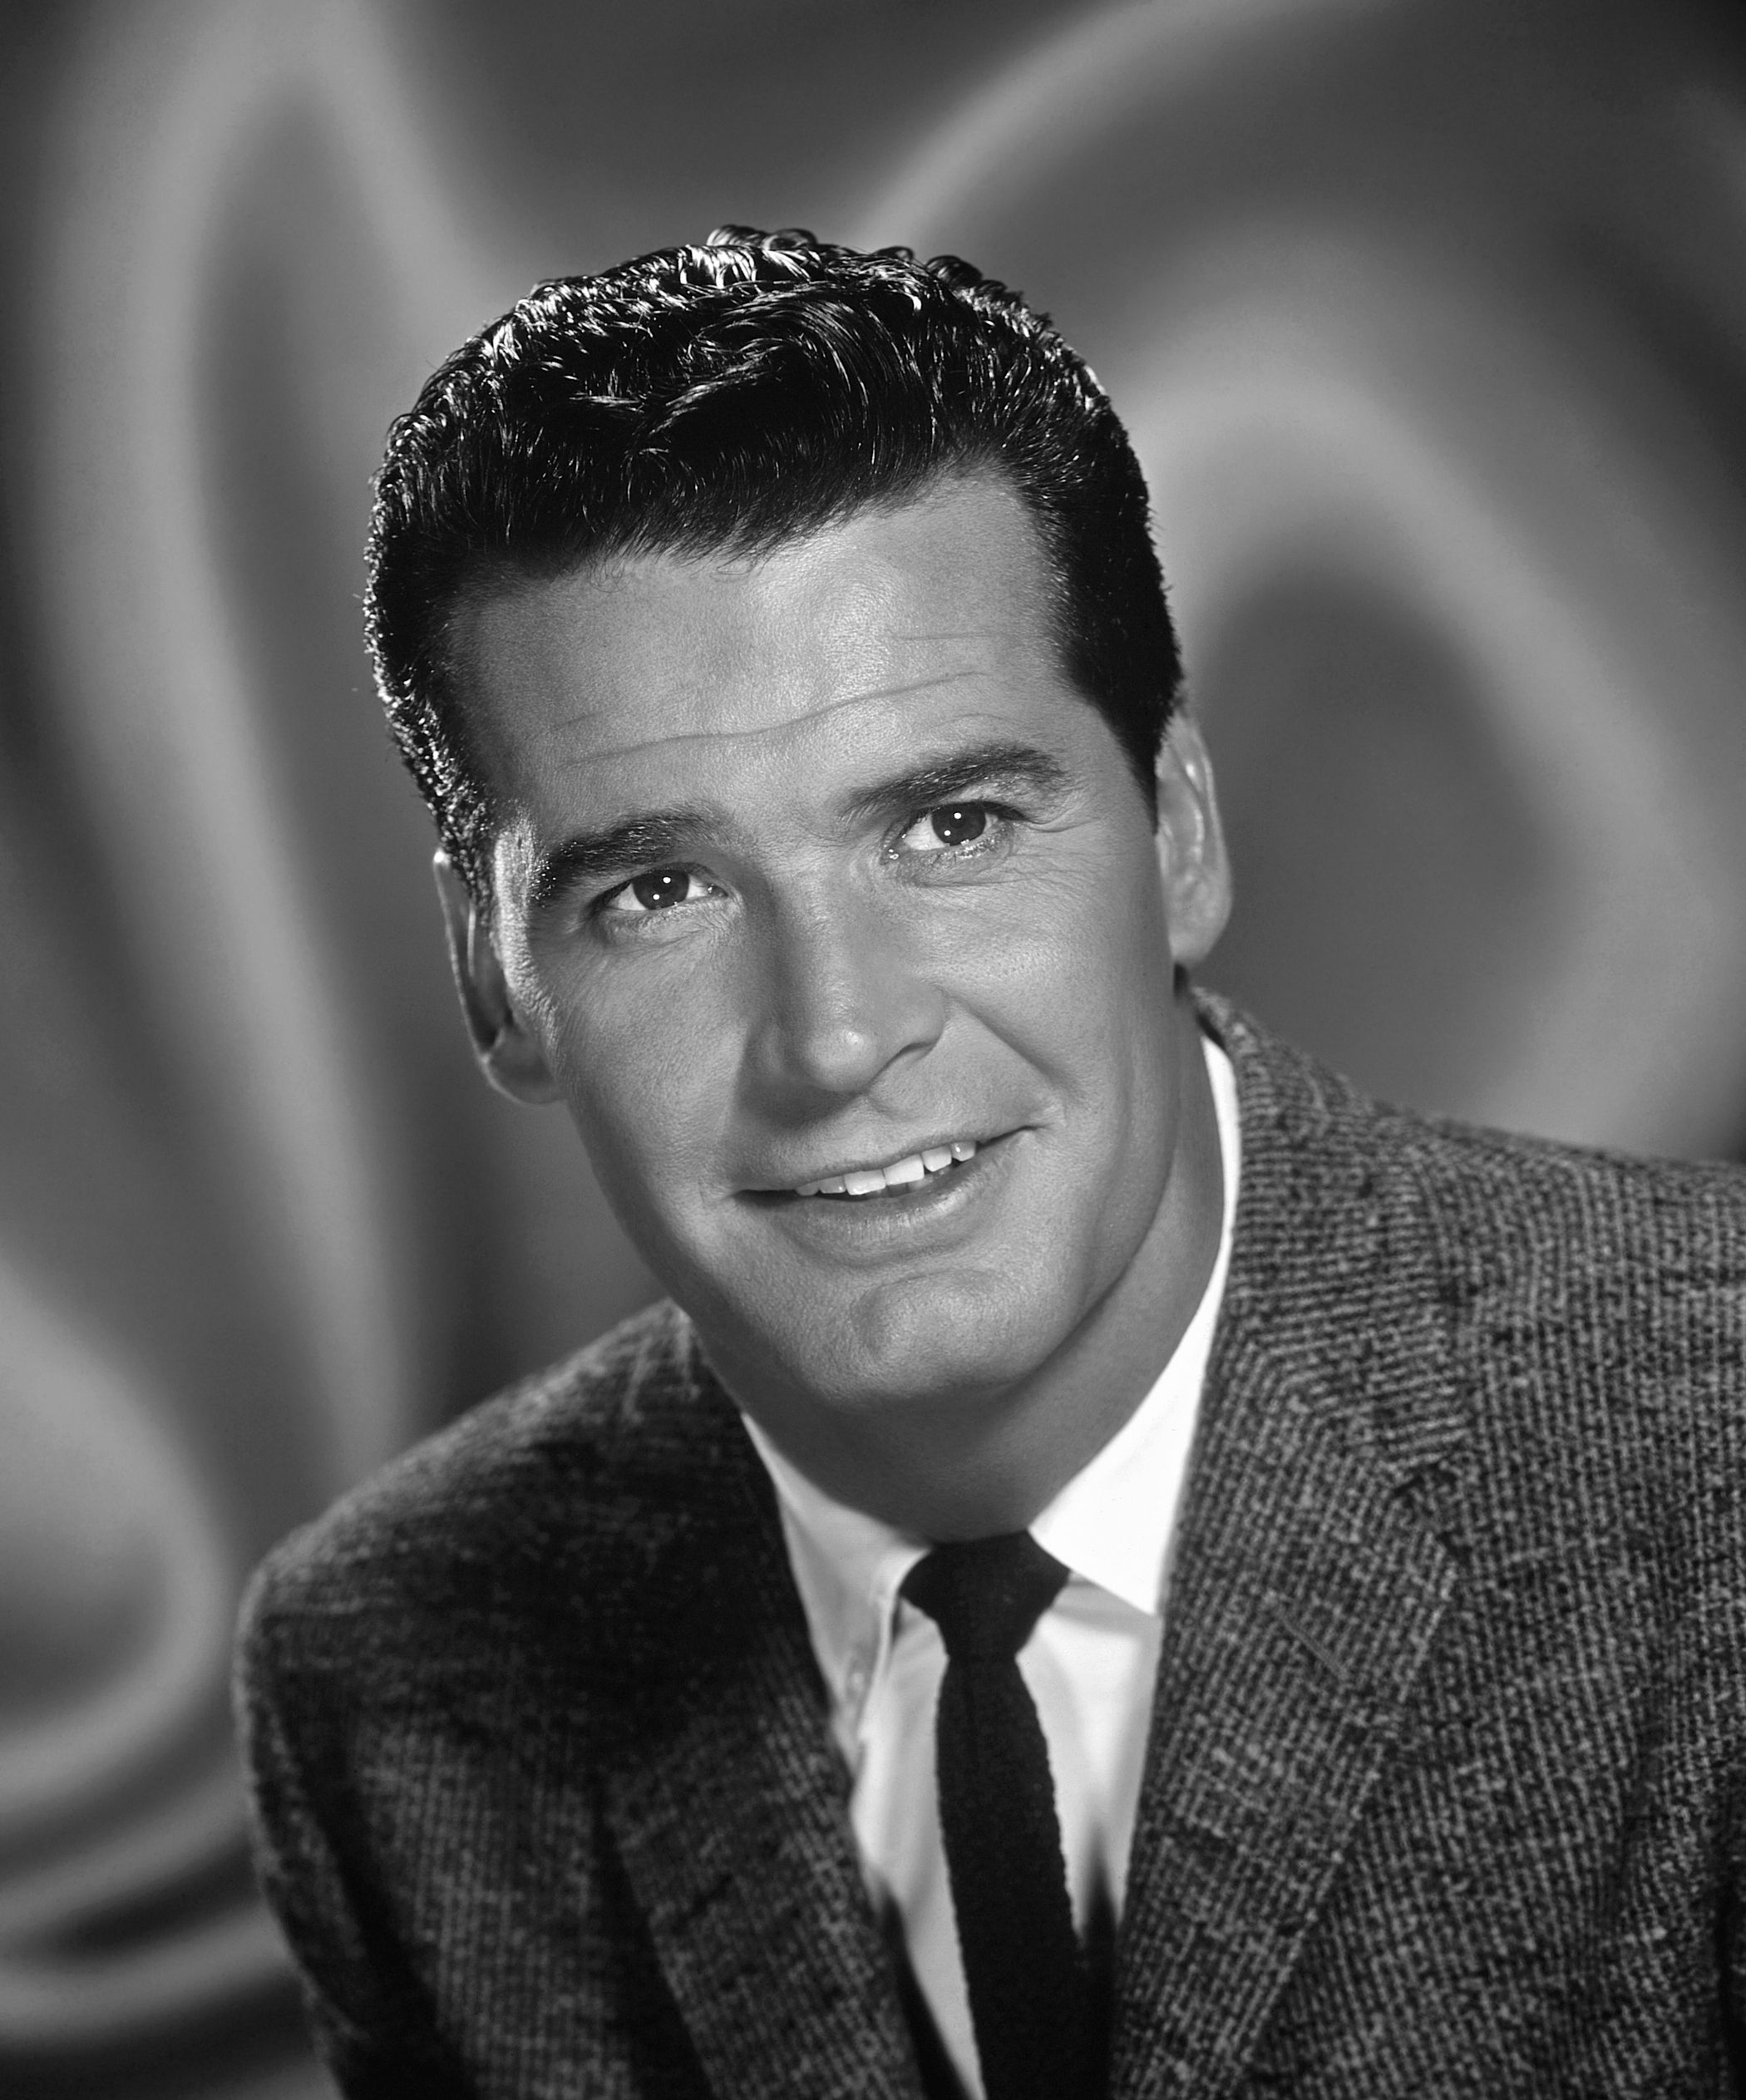 """Born James Scott Bumgarner, James Garner (07 Apr 1928"